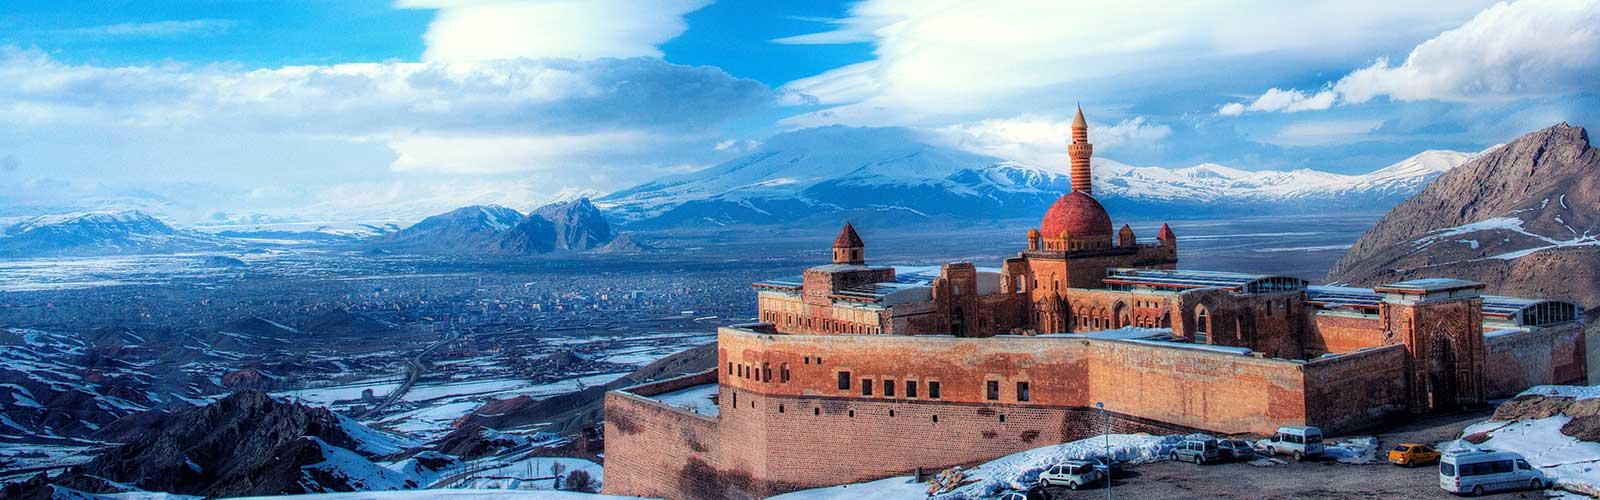 Ishakpasha Palace, Eastern Anatolia, Turkey